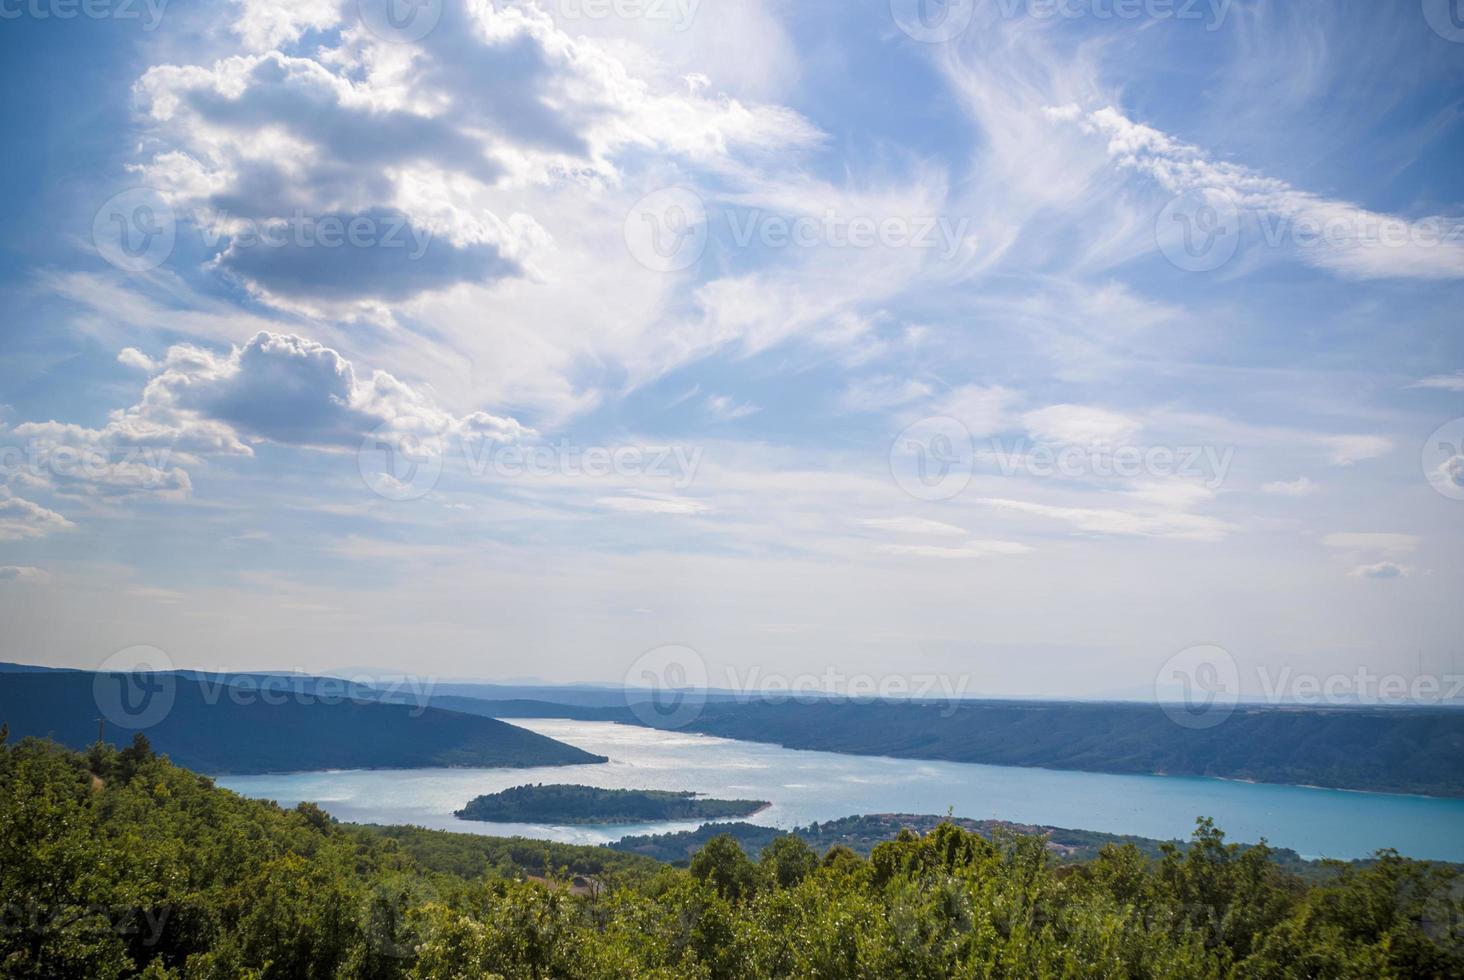 verdon klyfta och St. croix lake, provence foto